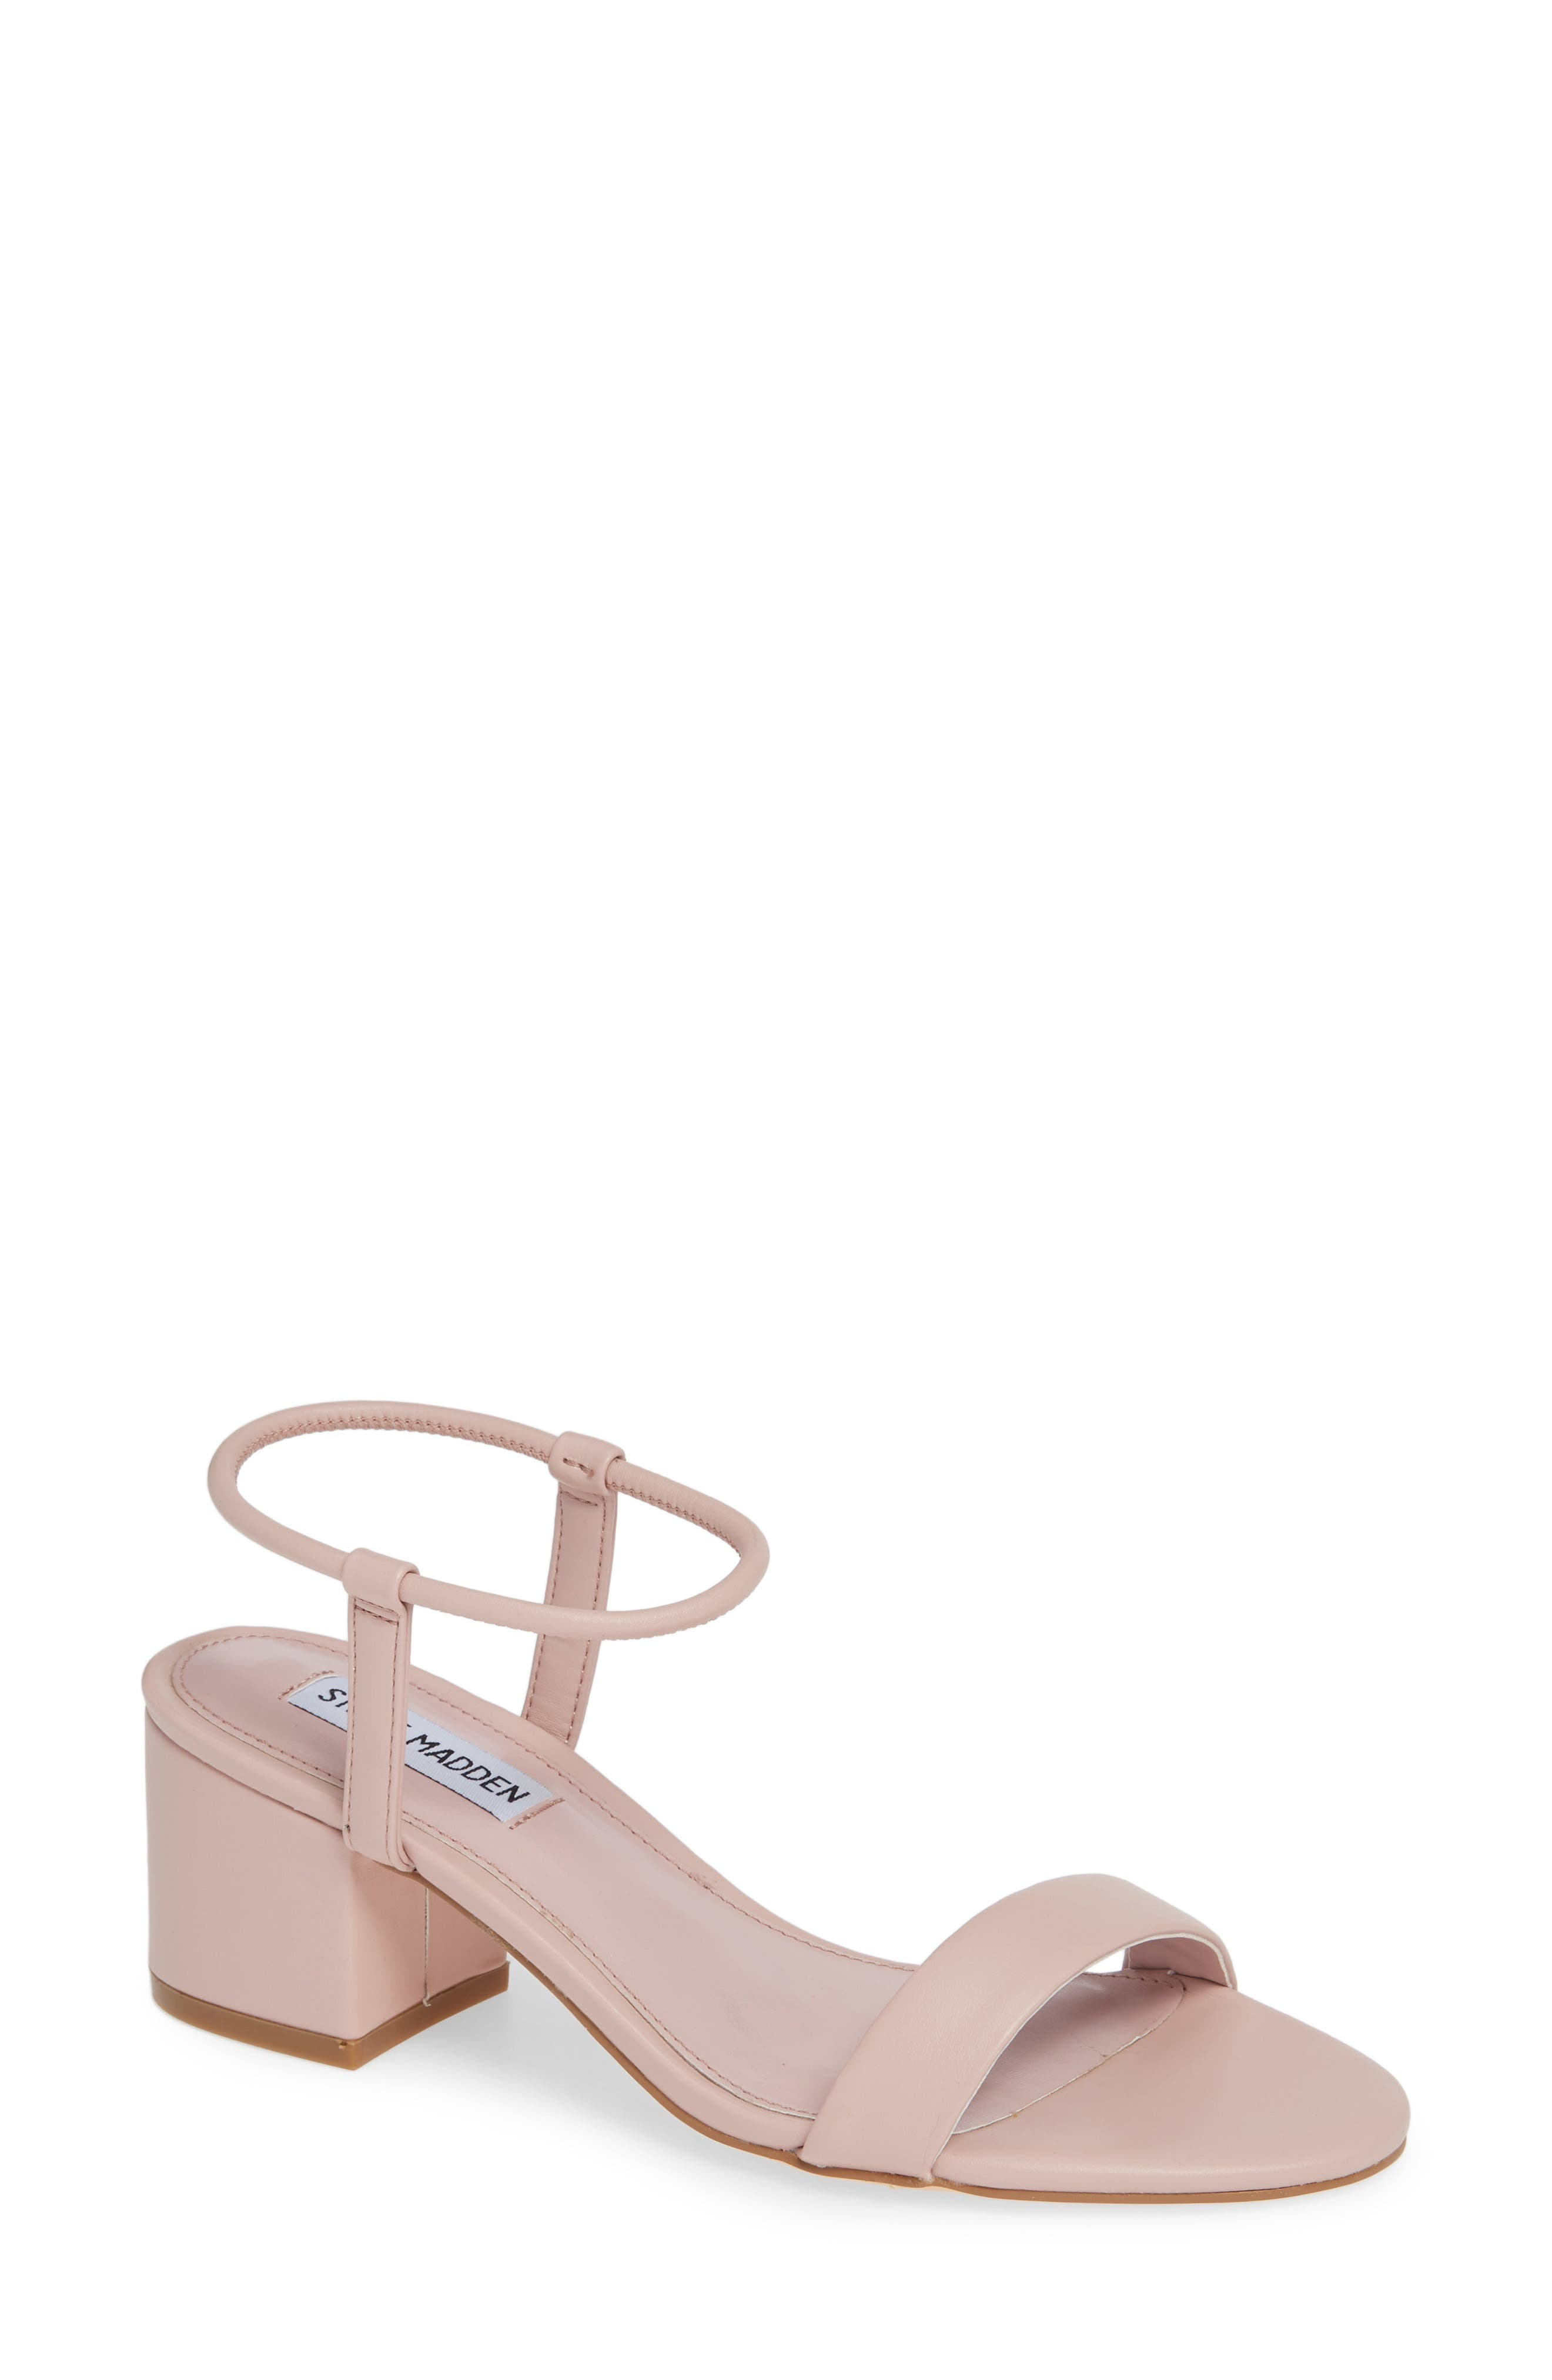 Ida Sandal, Light Pink